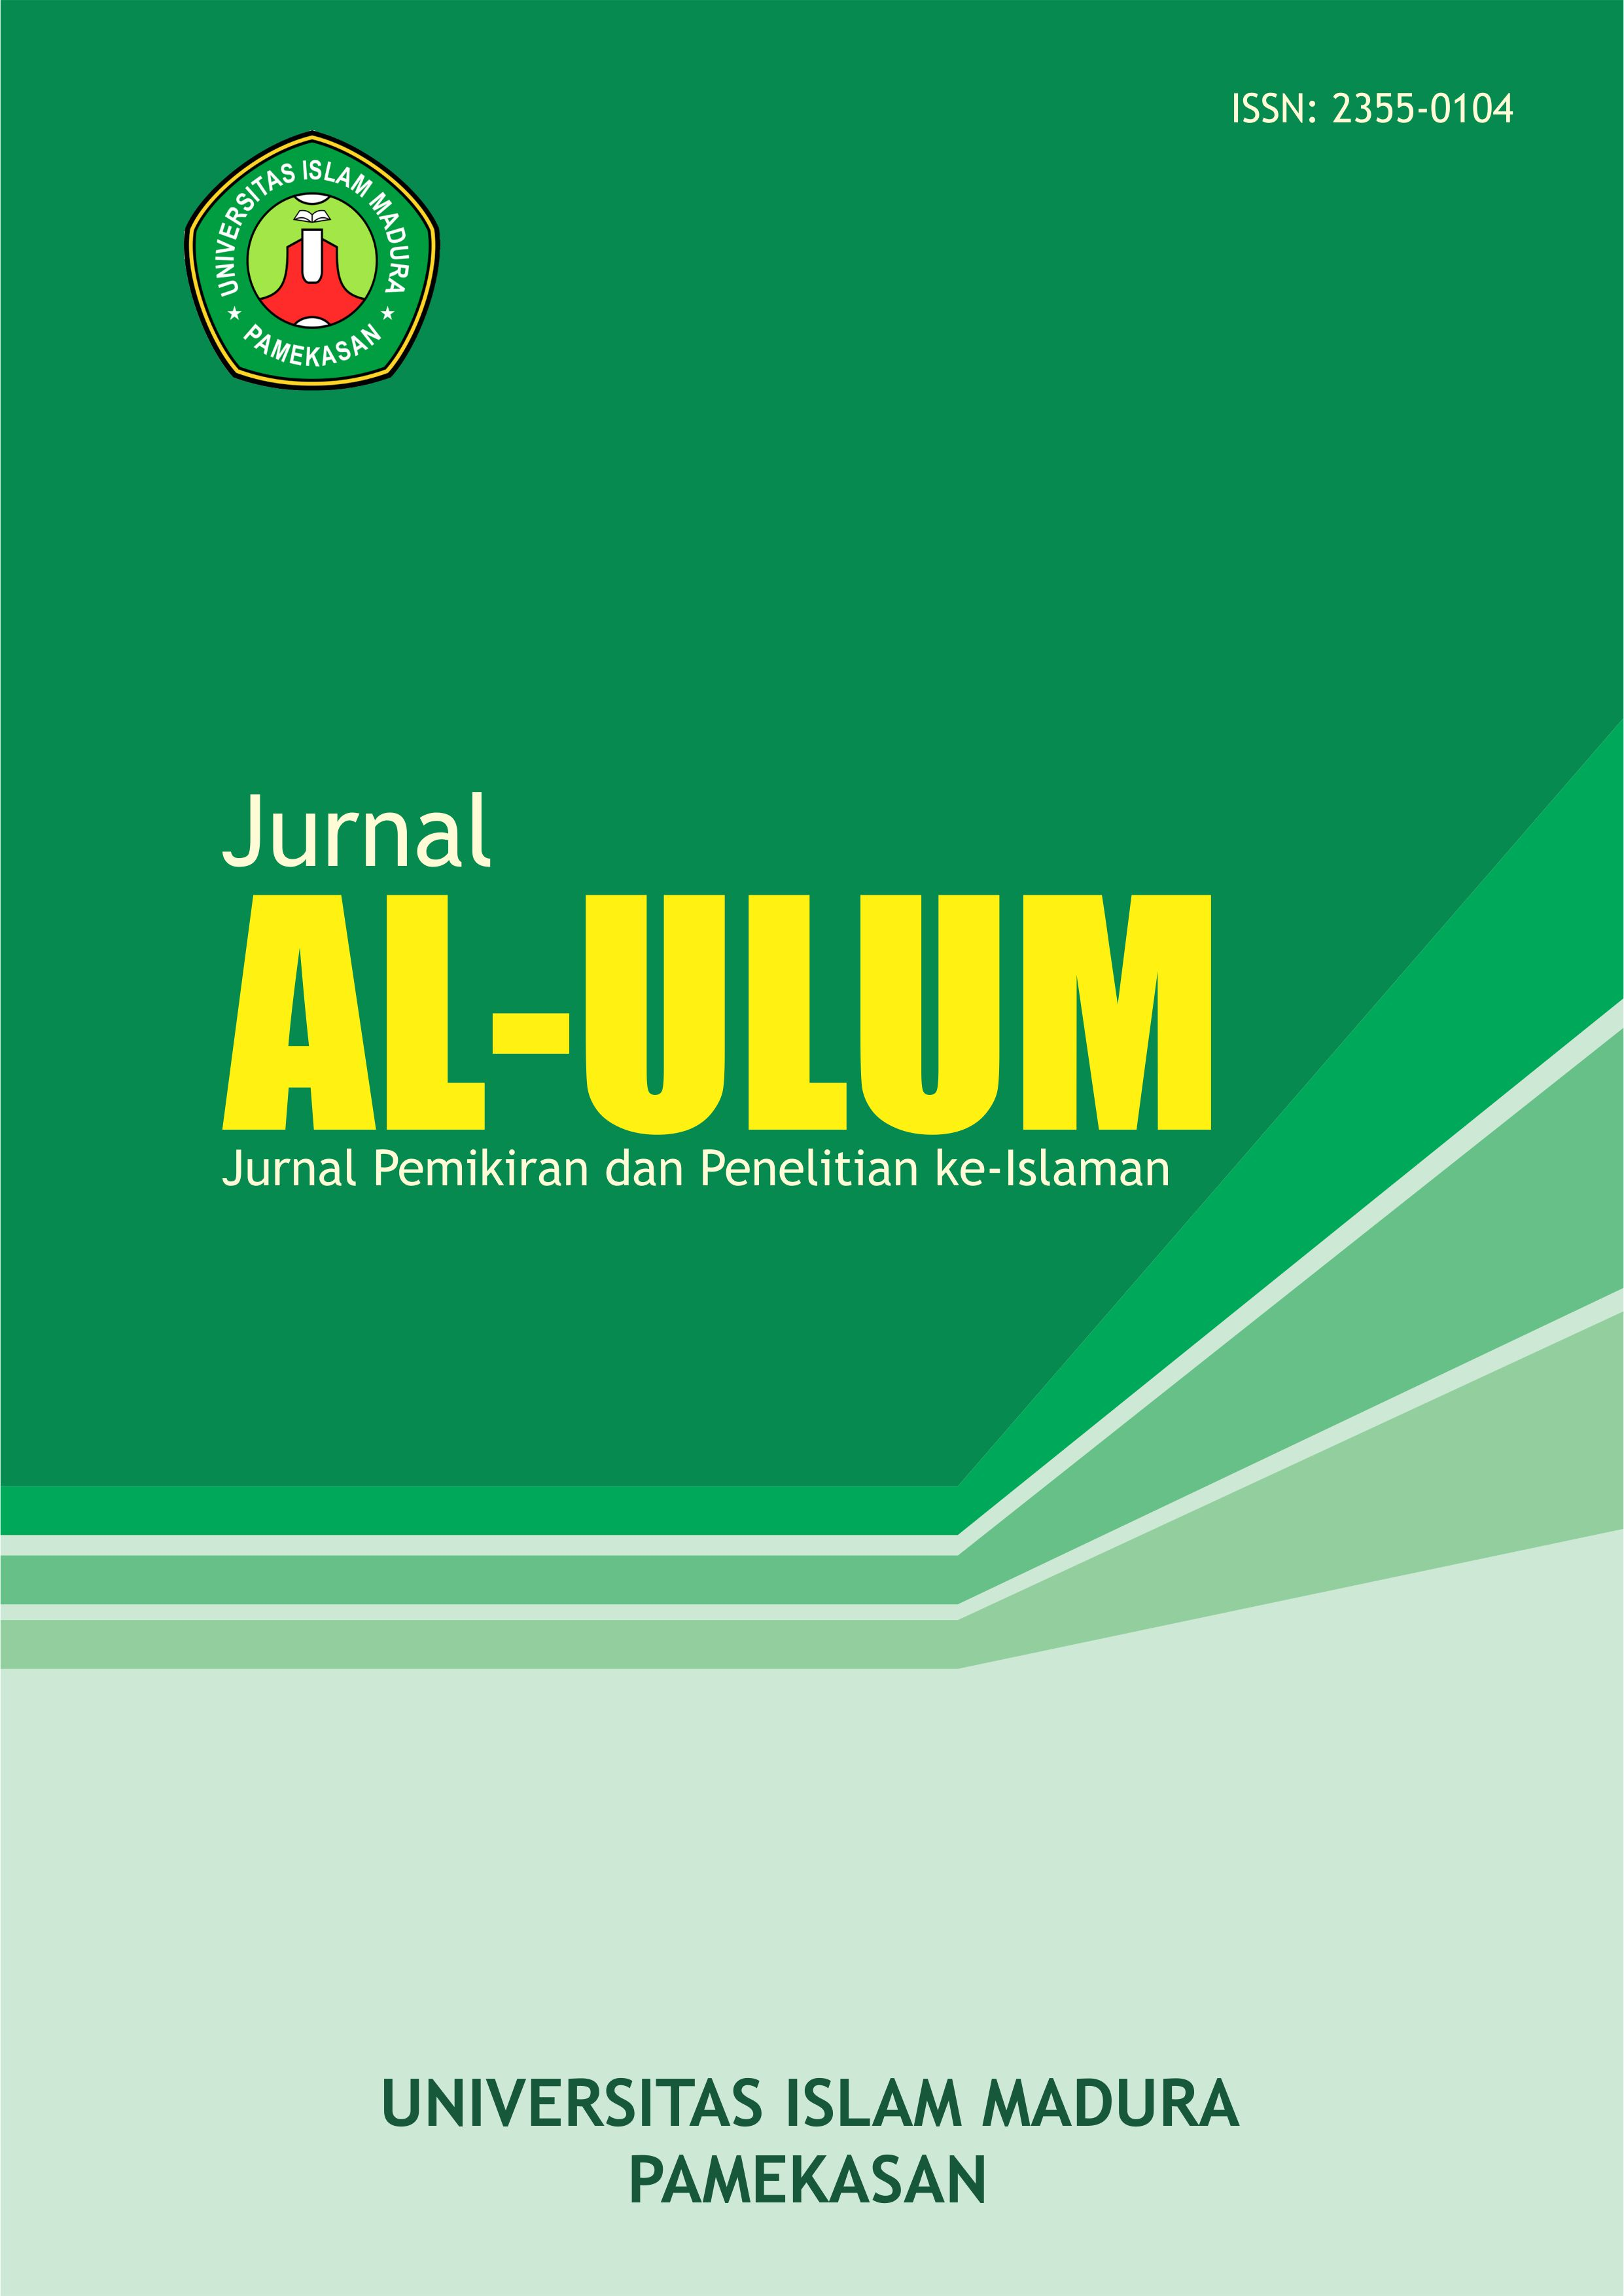 Jurnal Al-Ulum Universitas Islam Madura (UIM) Pamekasan